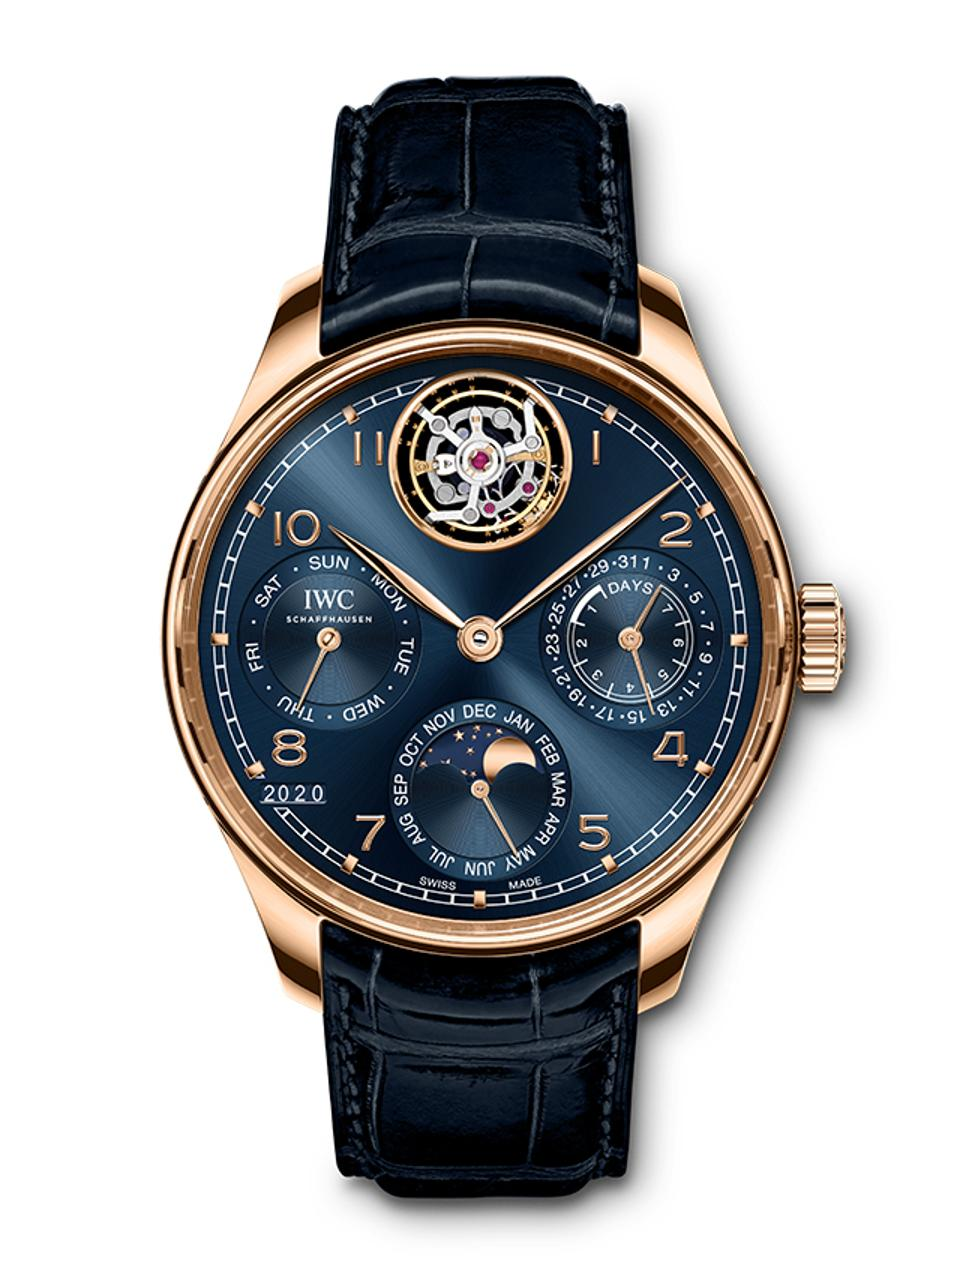 IWC Portugieser Timepiece